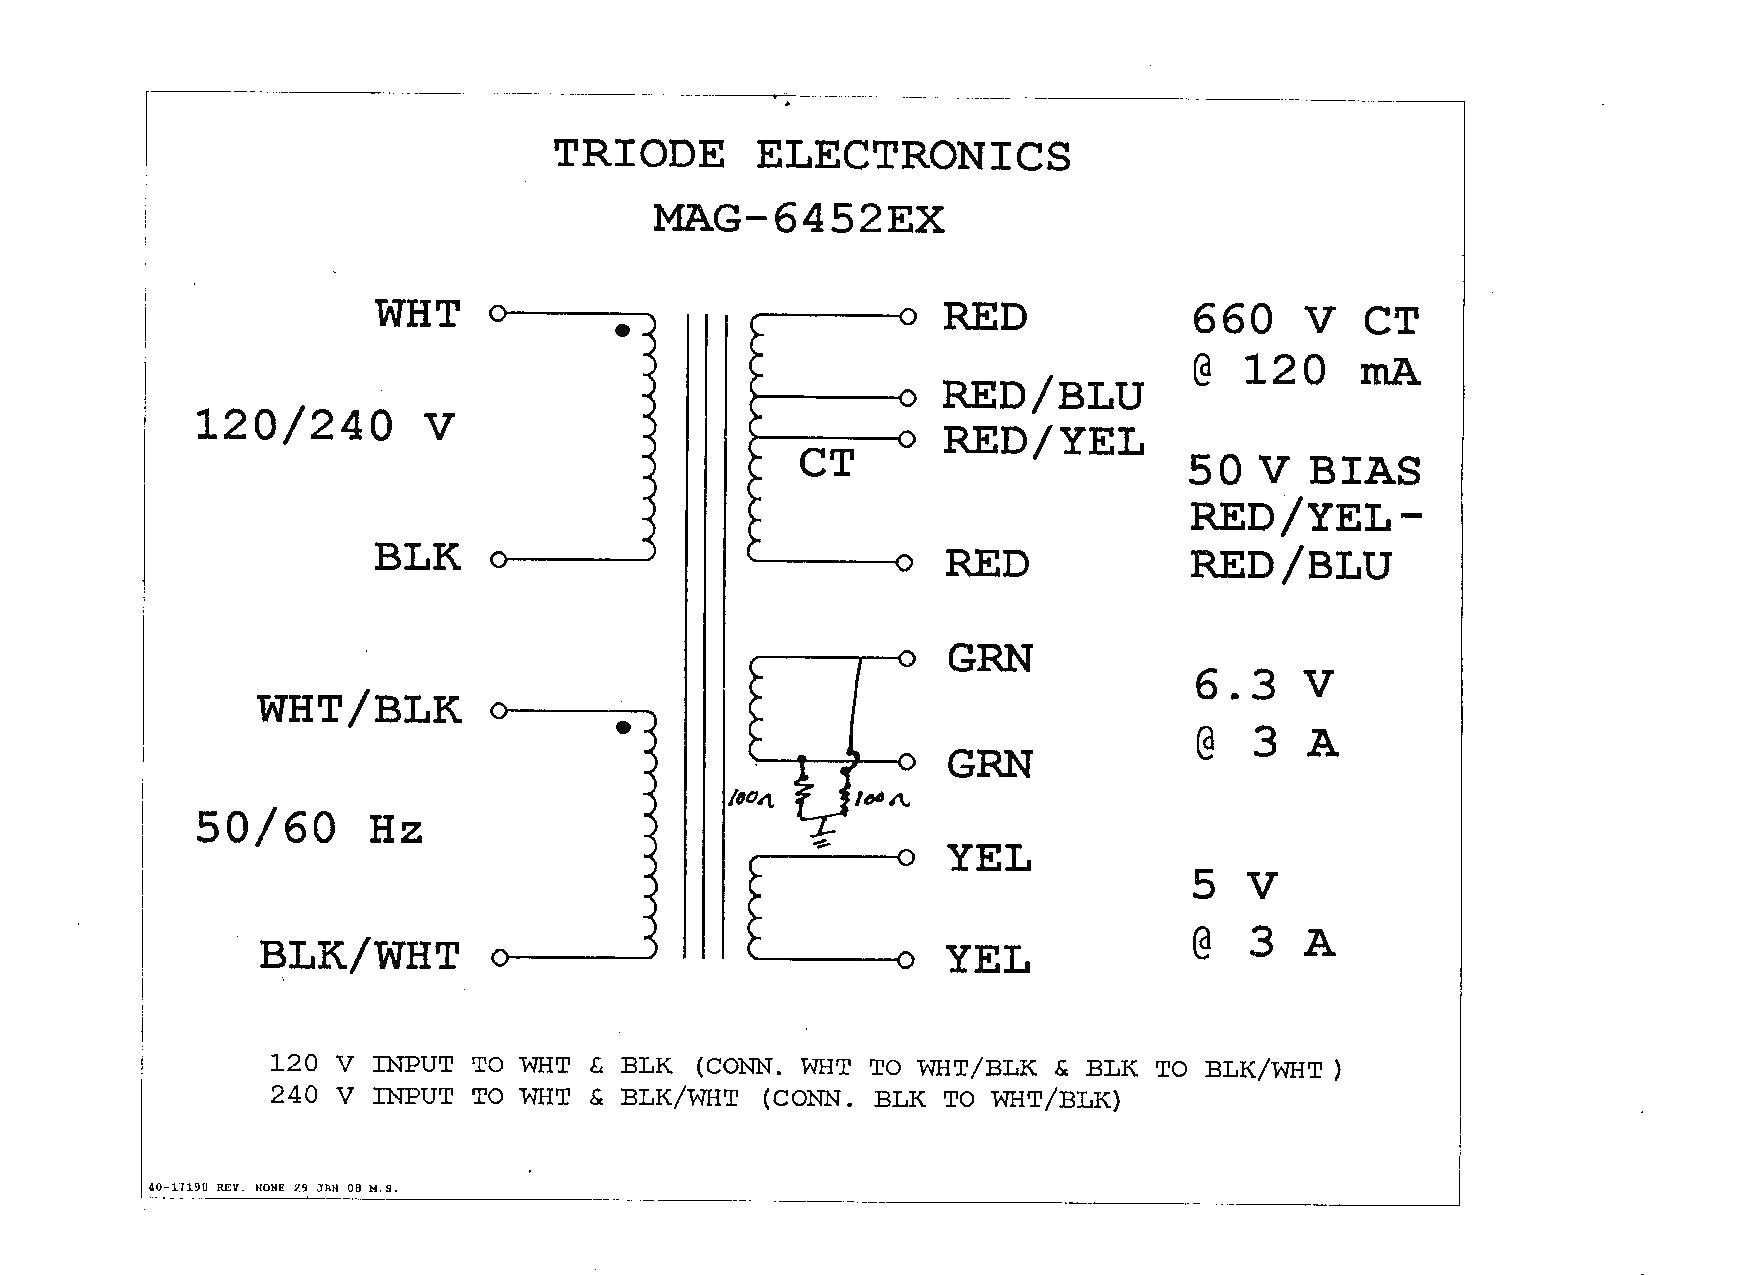 Three Phase Wiring Diagram Three Phase Wiring Diagram 2018 Cutler Hammer Starter Wiring Diagram Of Three Phase Wiring Diagram